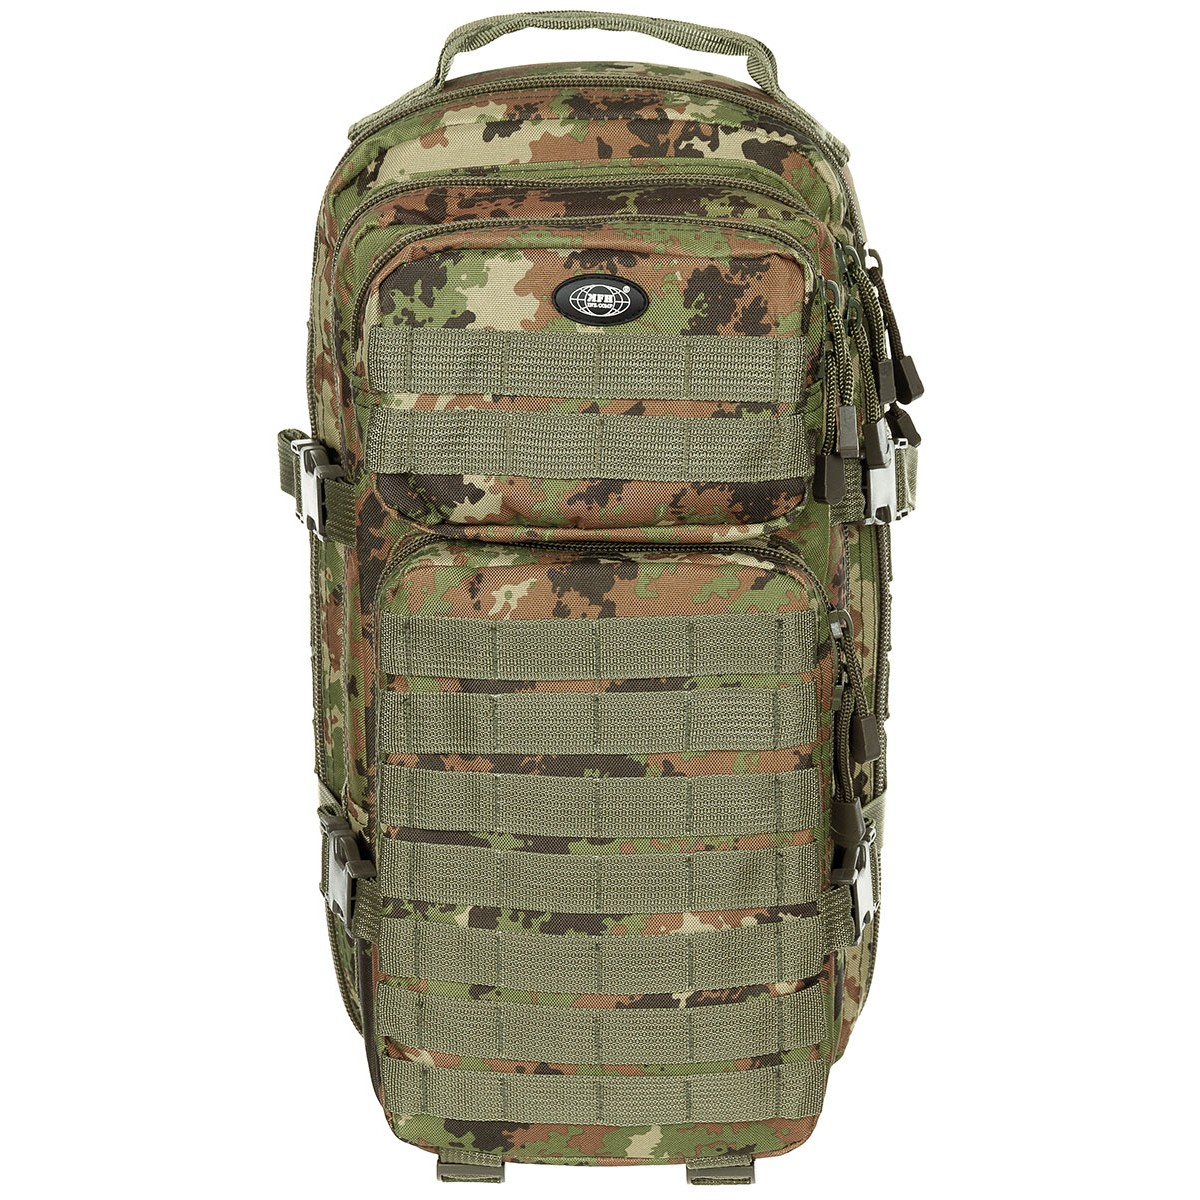 Batoh MFH US Assault S - vegetato